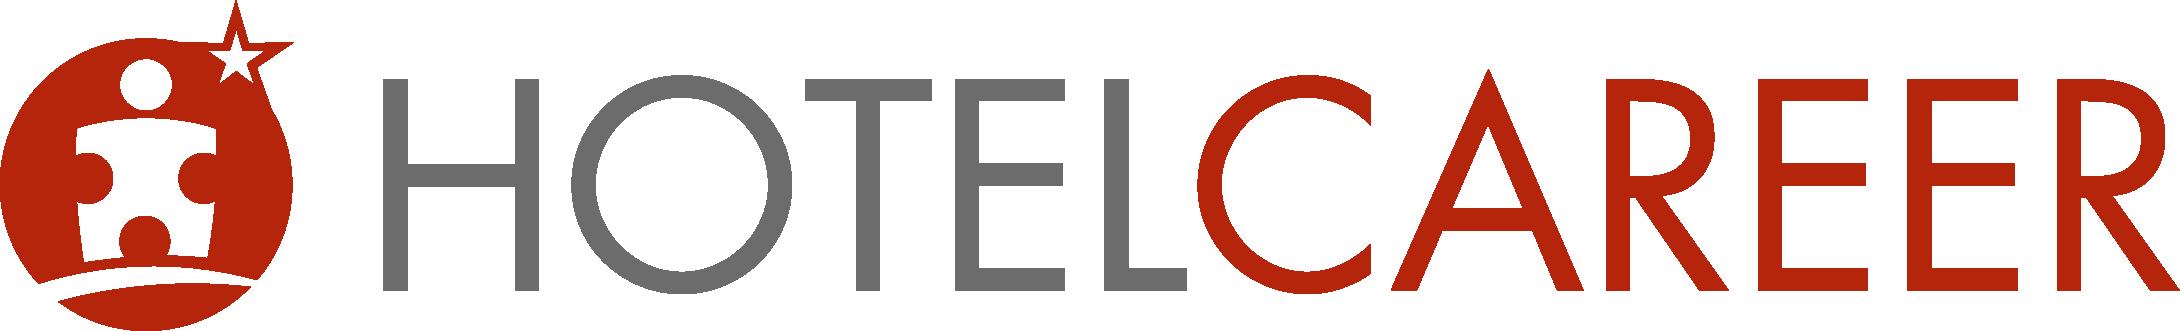 HotelCareer / GastroJOBS Logo